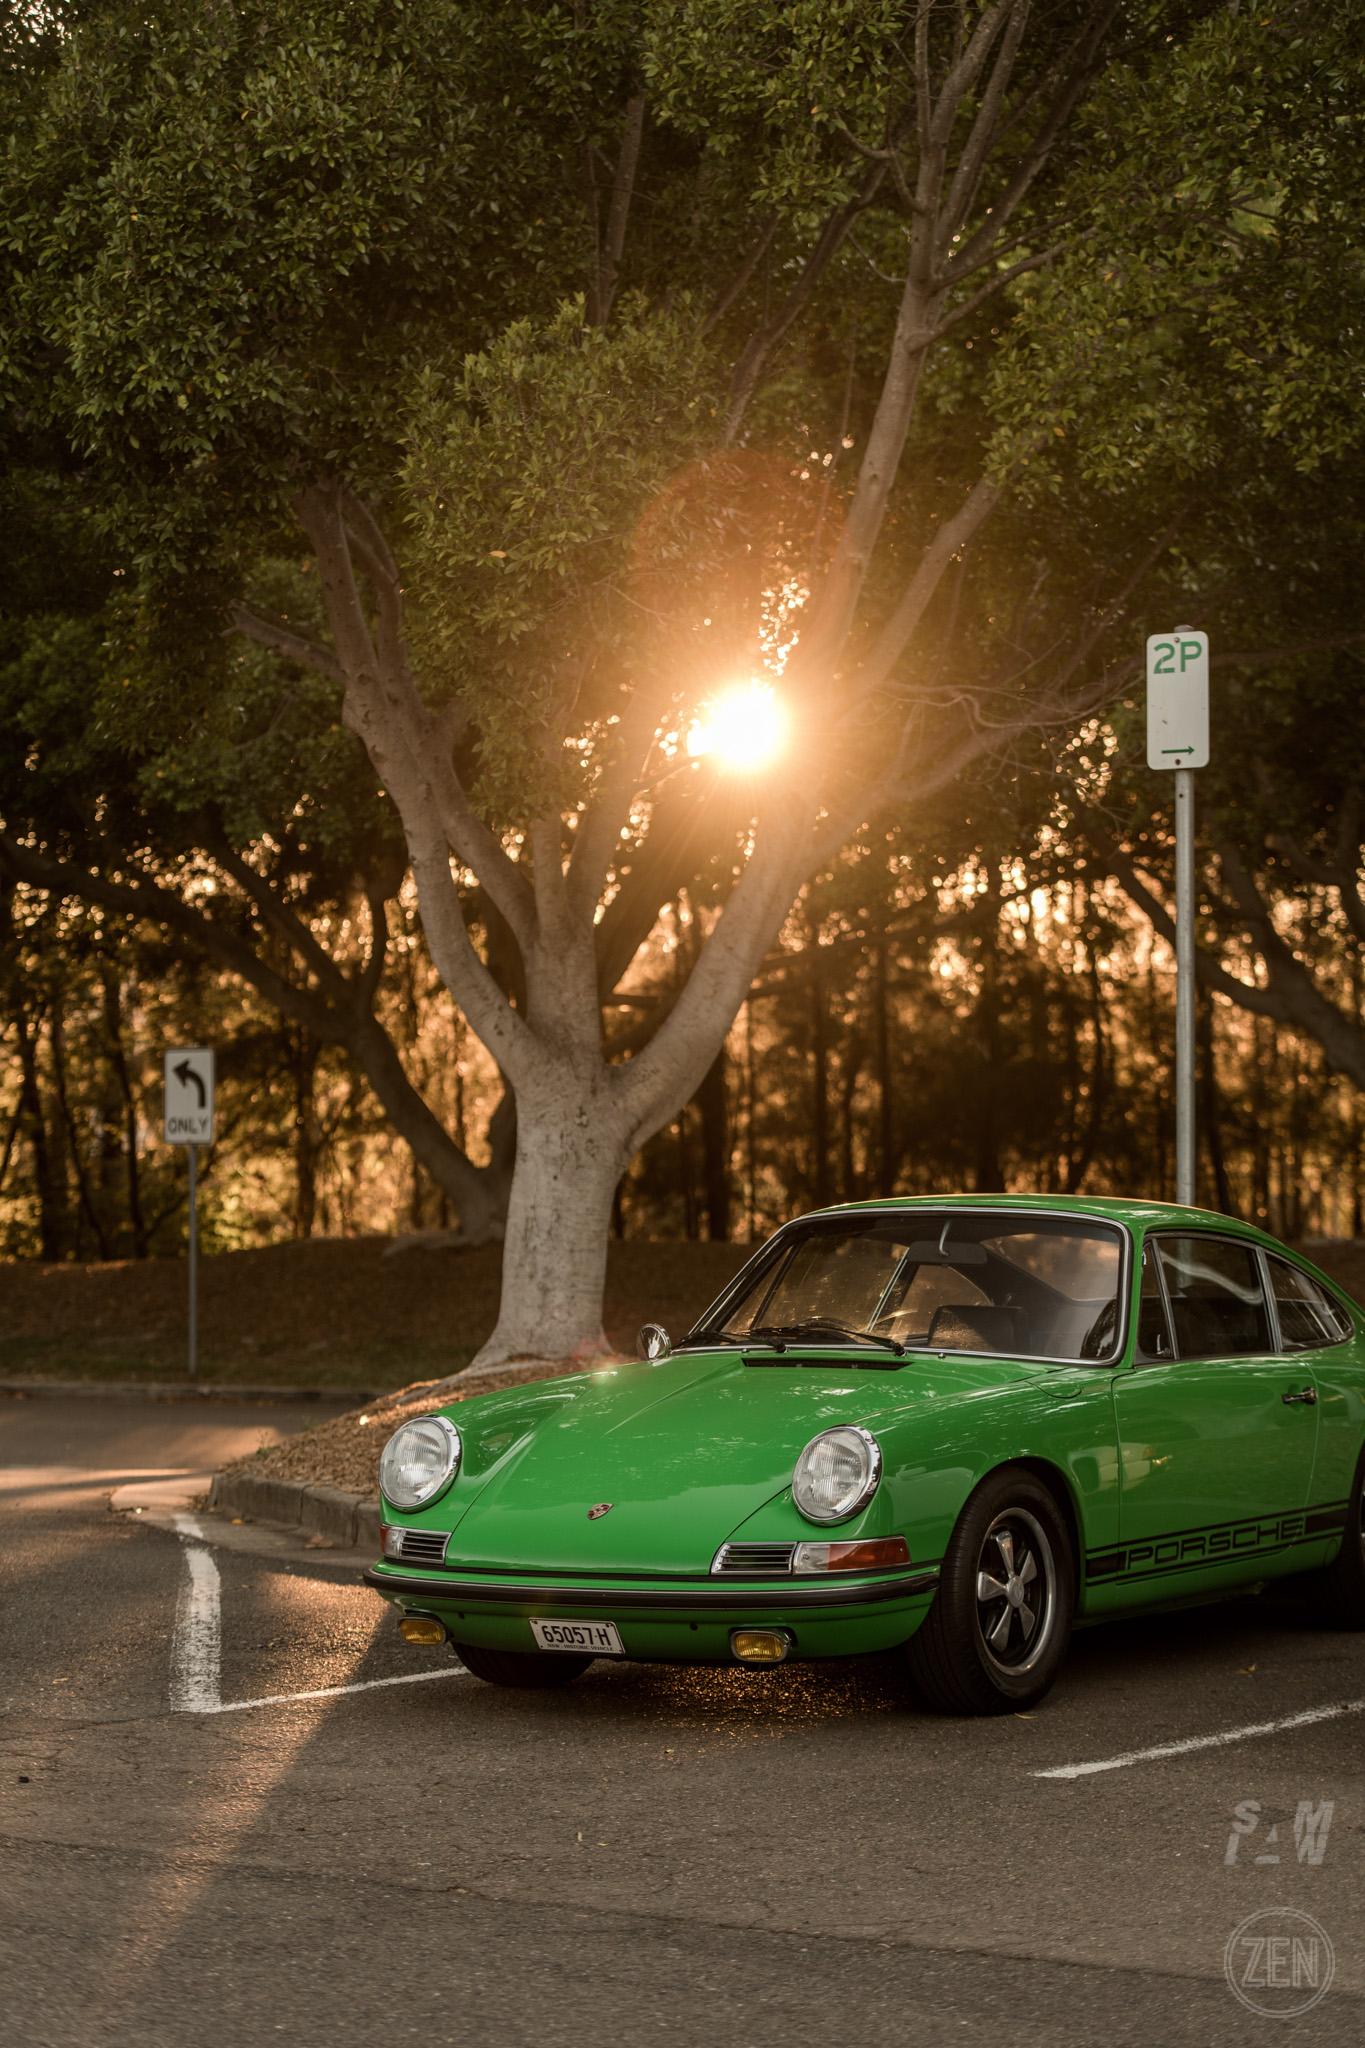 2019-10-27 - Autohaus Porsches & Coffee 014